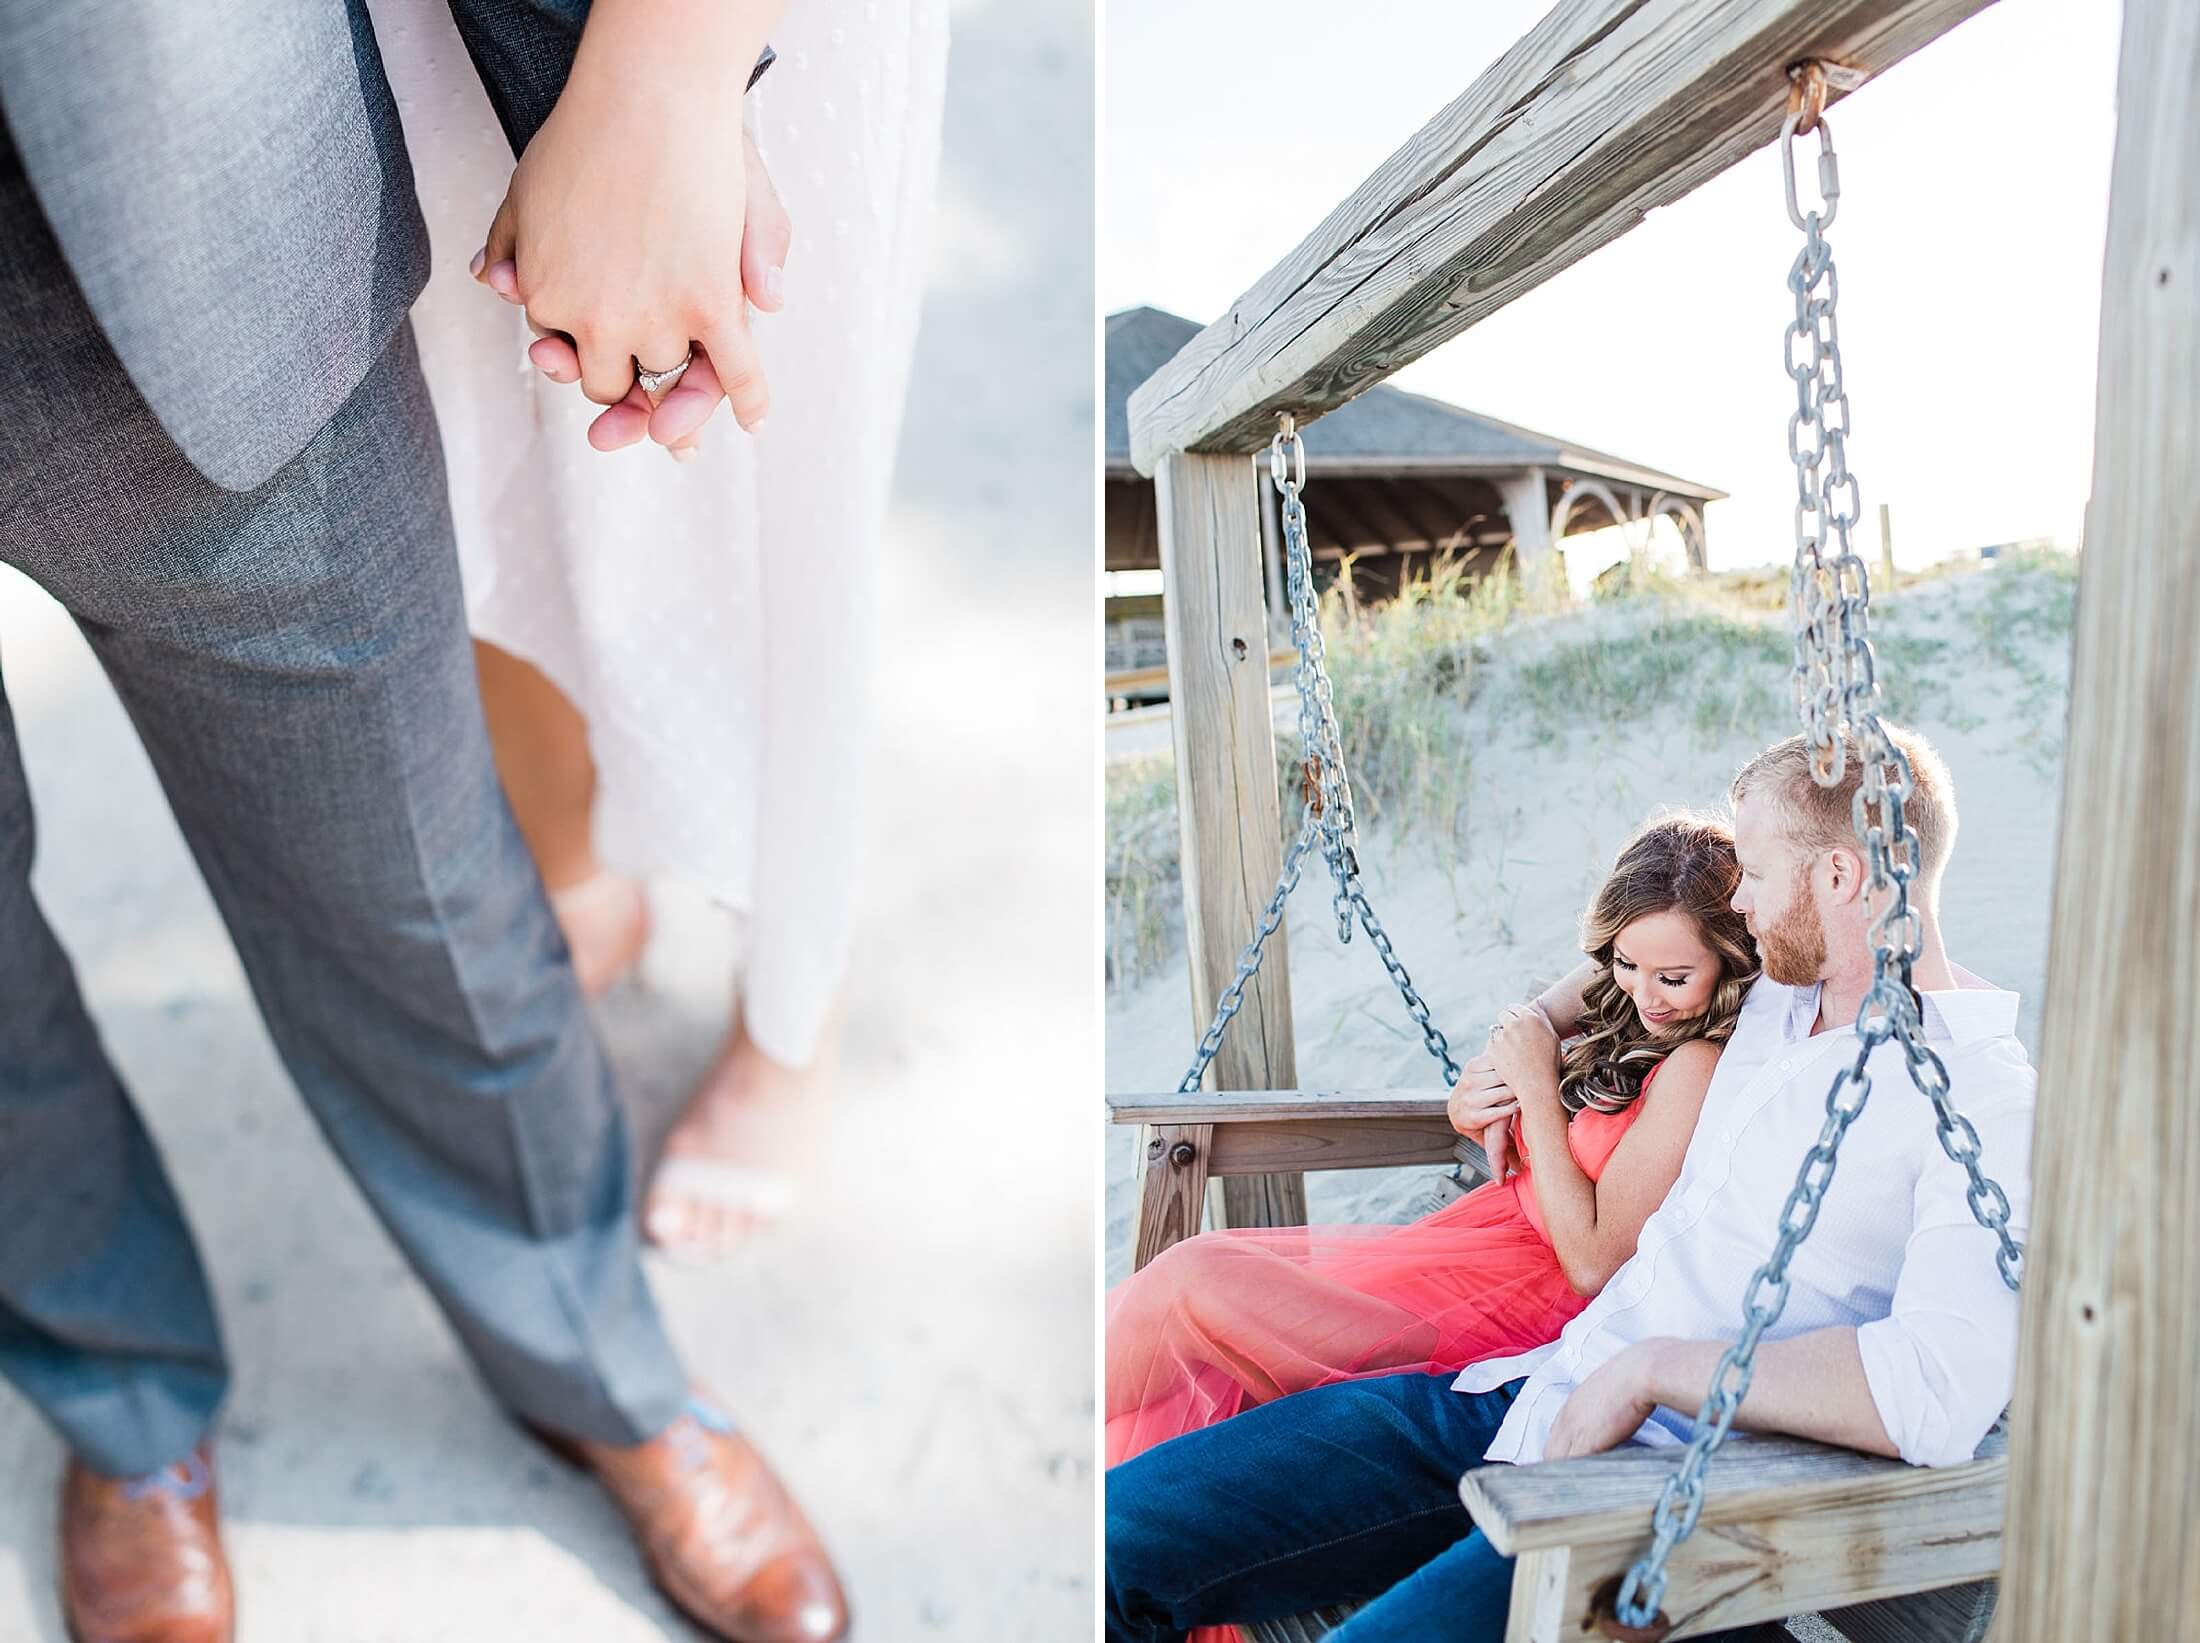 Apt-b-photography-savannah-engagement-photographer-savannah-wedding-hilton-head-elopement-savannah-wedding-photographer-8.jpg